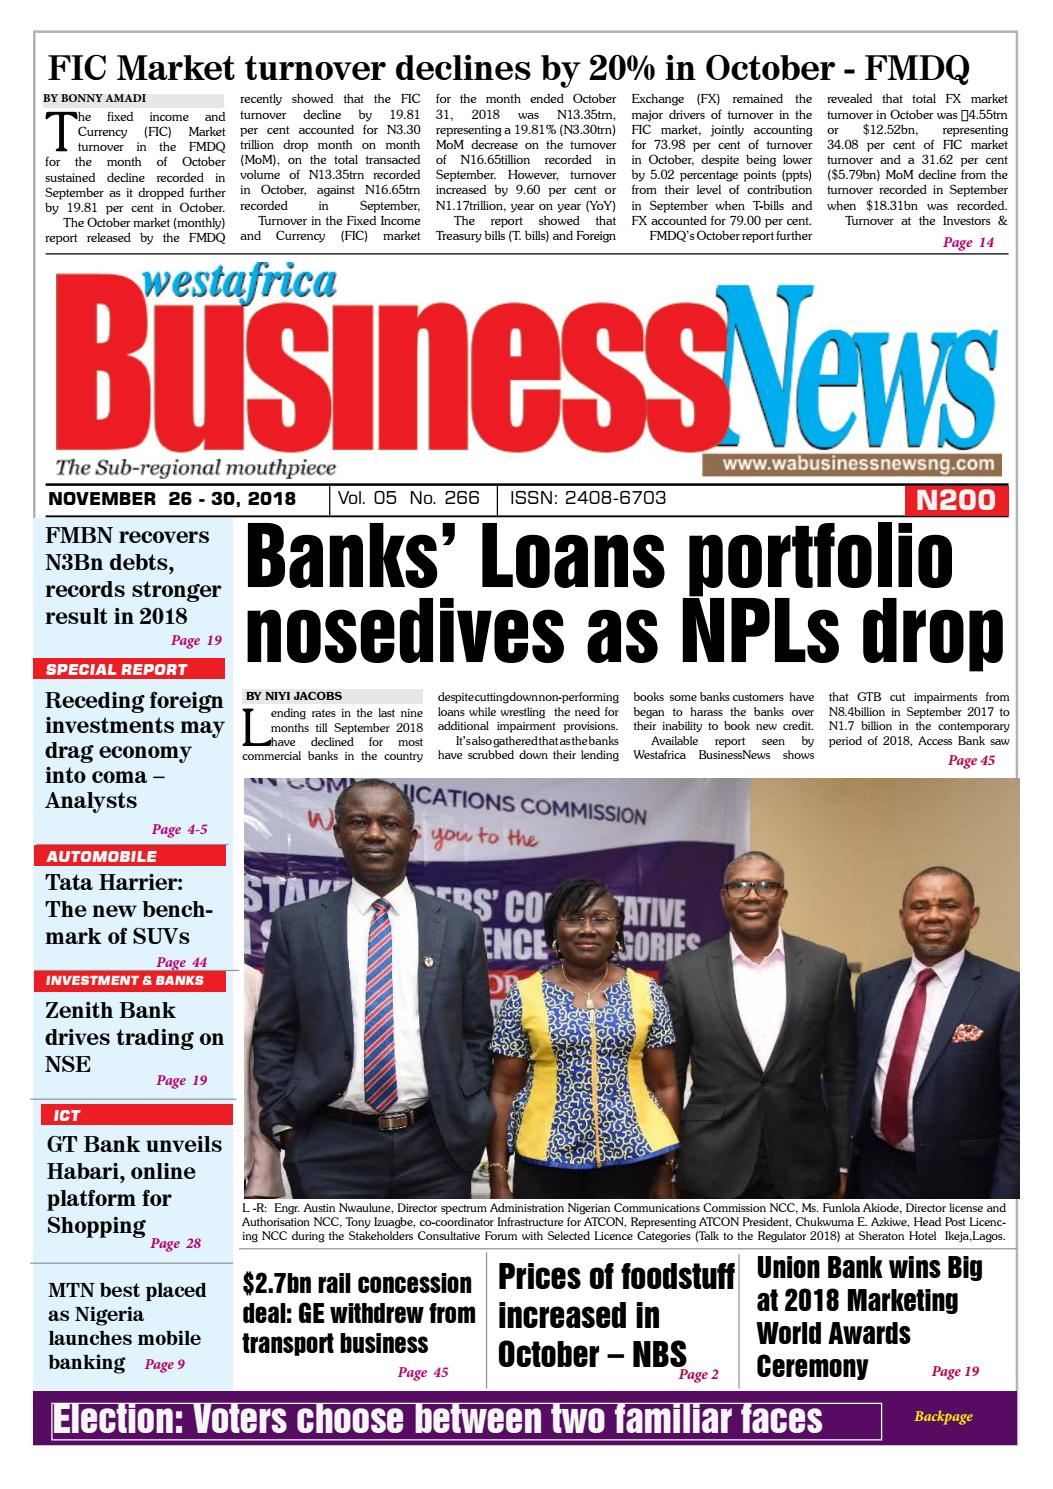 Westafrica BusinessNews Nov  26-30, 2018